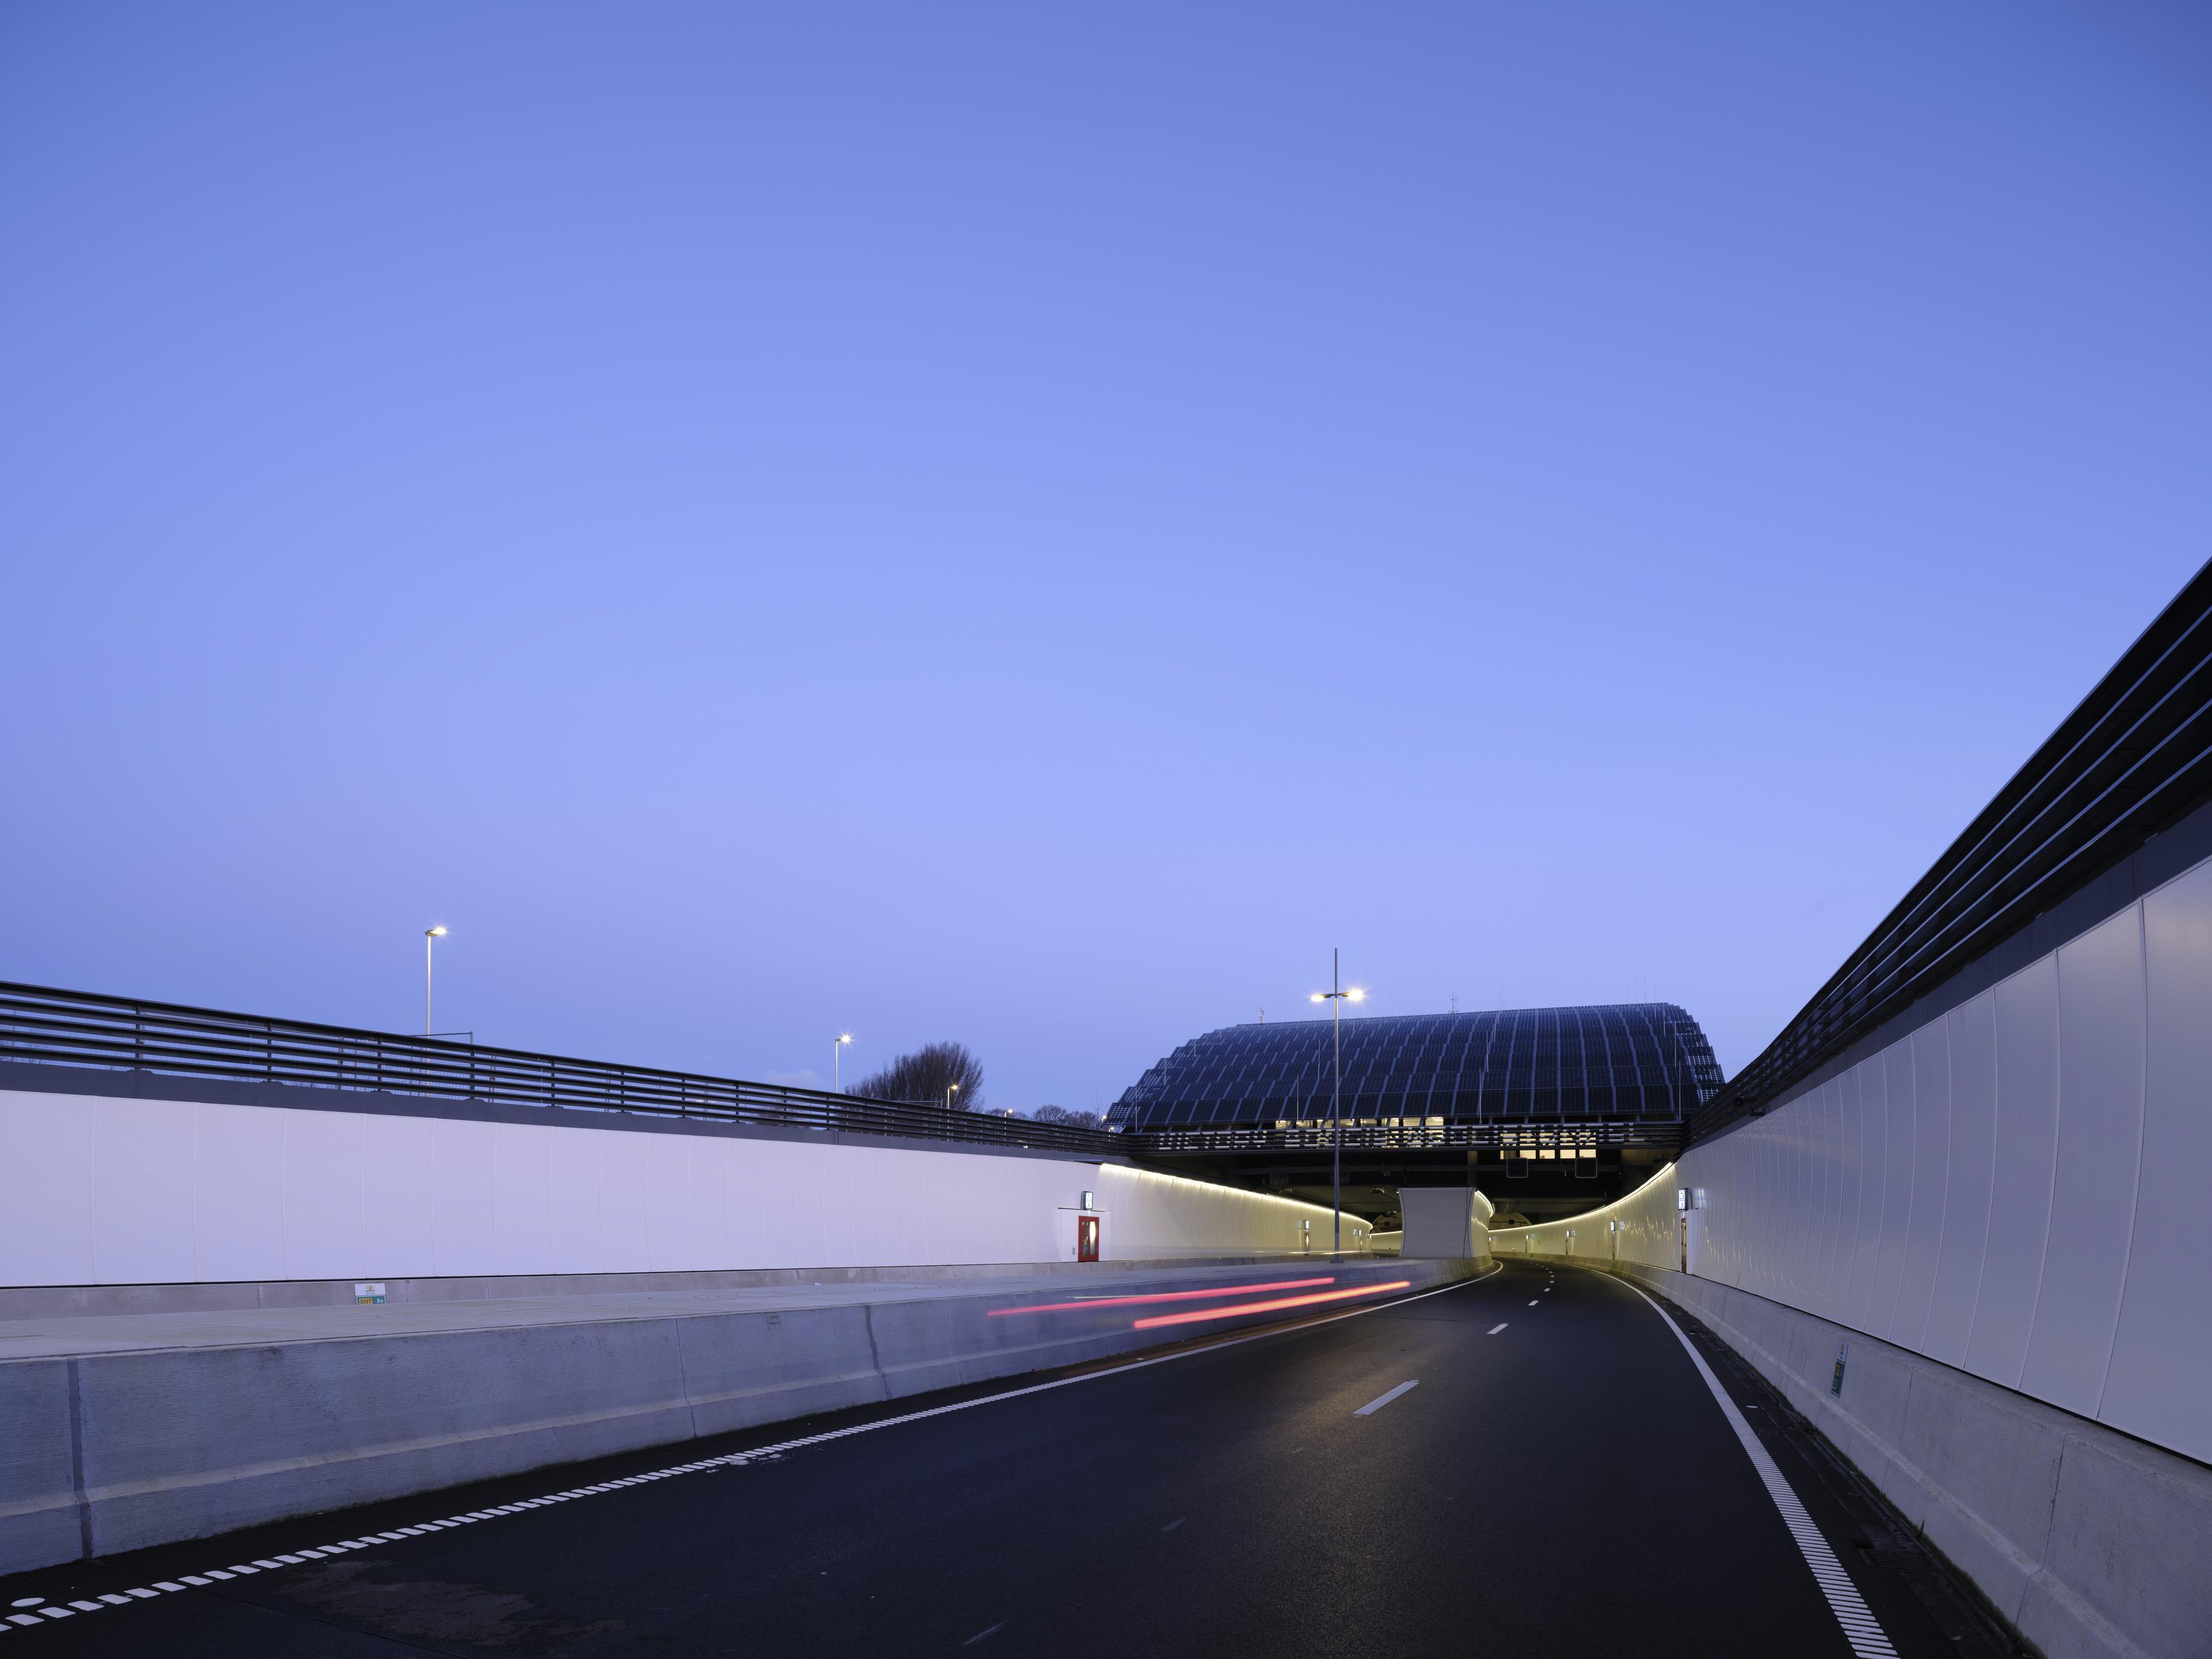 767 Rotterdamse baan N46 a4